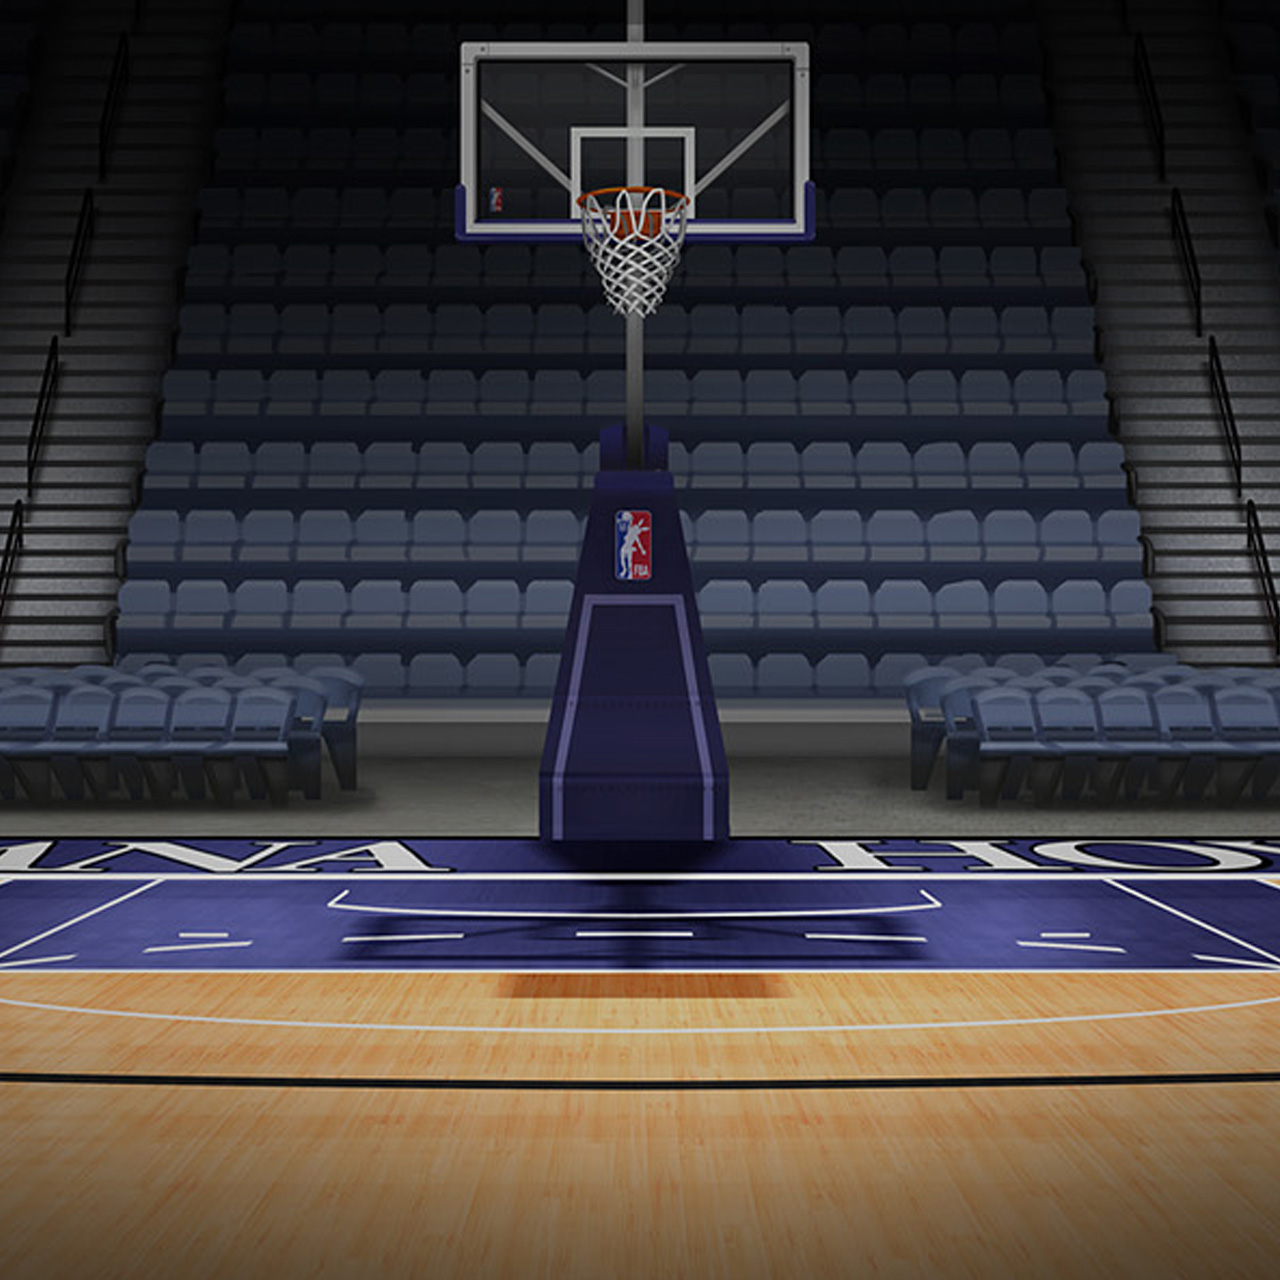 Basketball court wallpaper hd wallpapersafari for Free inside basketball courts